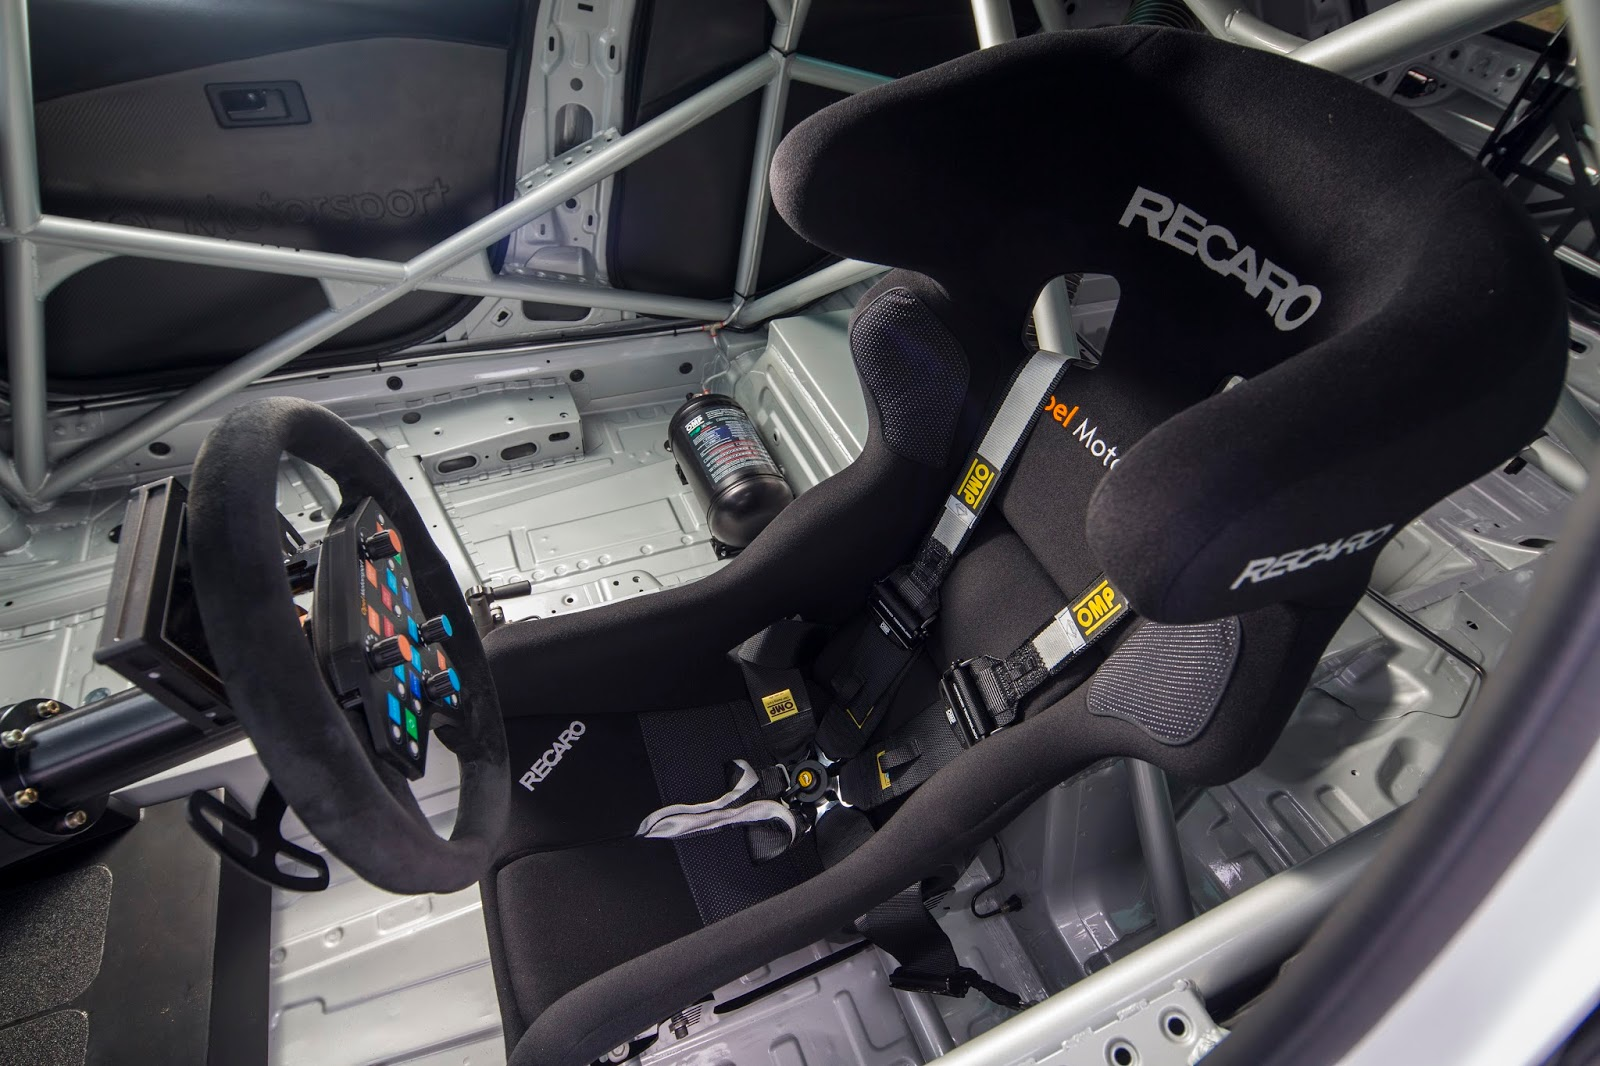 Opel Astra TCR 297894 Opel Astra TCR: Έτοιμο αγωνιστικό για το Nürburgring με 330 άλογα Hatcback, Nurburgring, Opel, Opel Astra, Opel Astra TCR, Rally